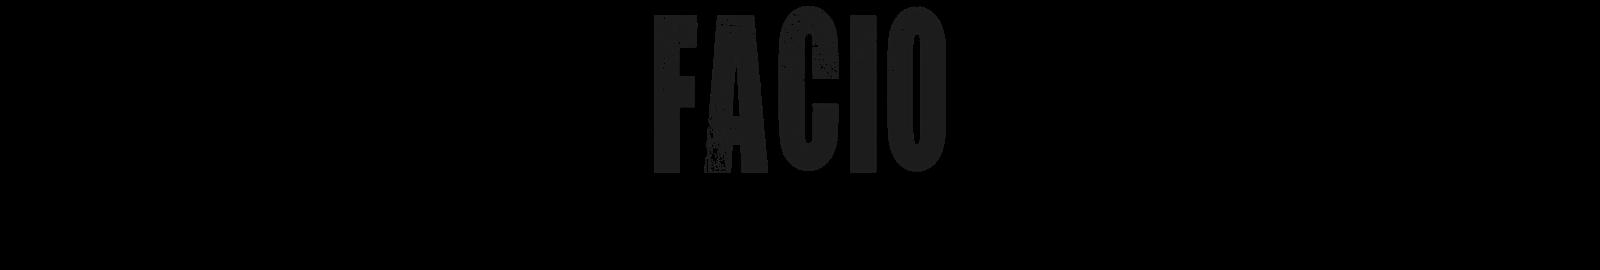 05_2016_logo_oben